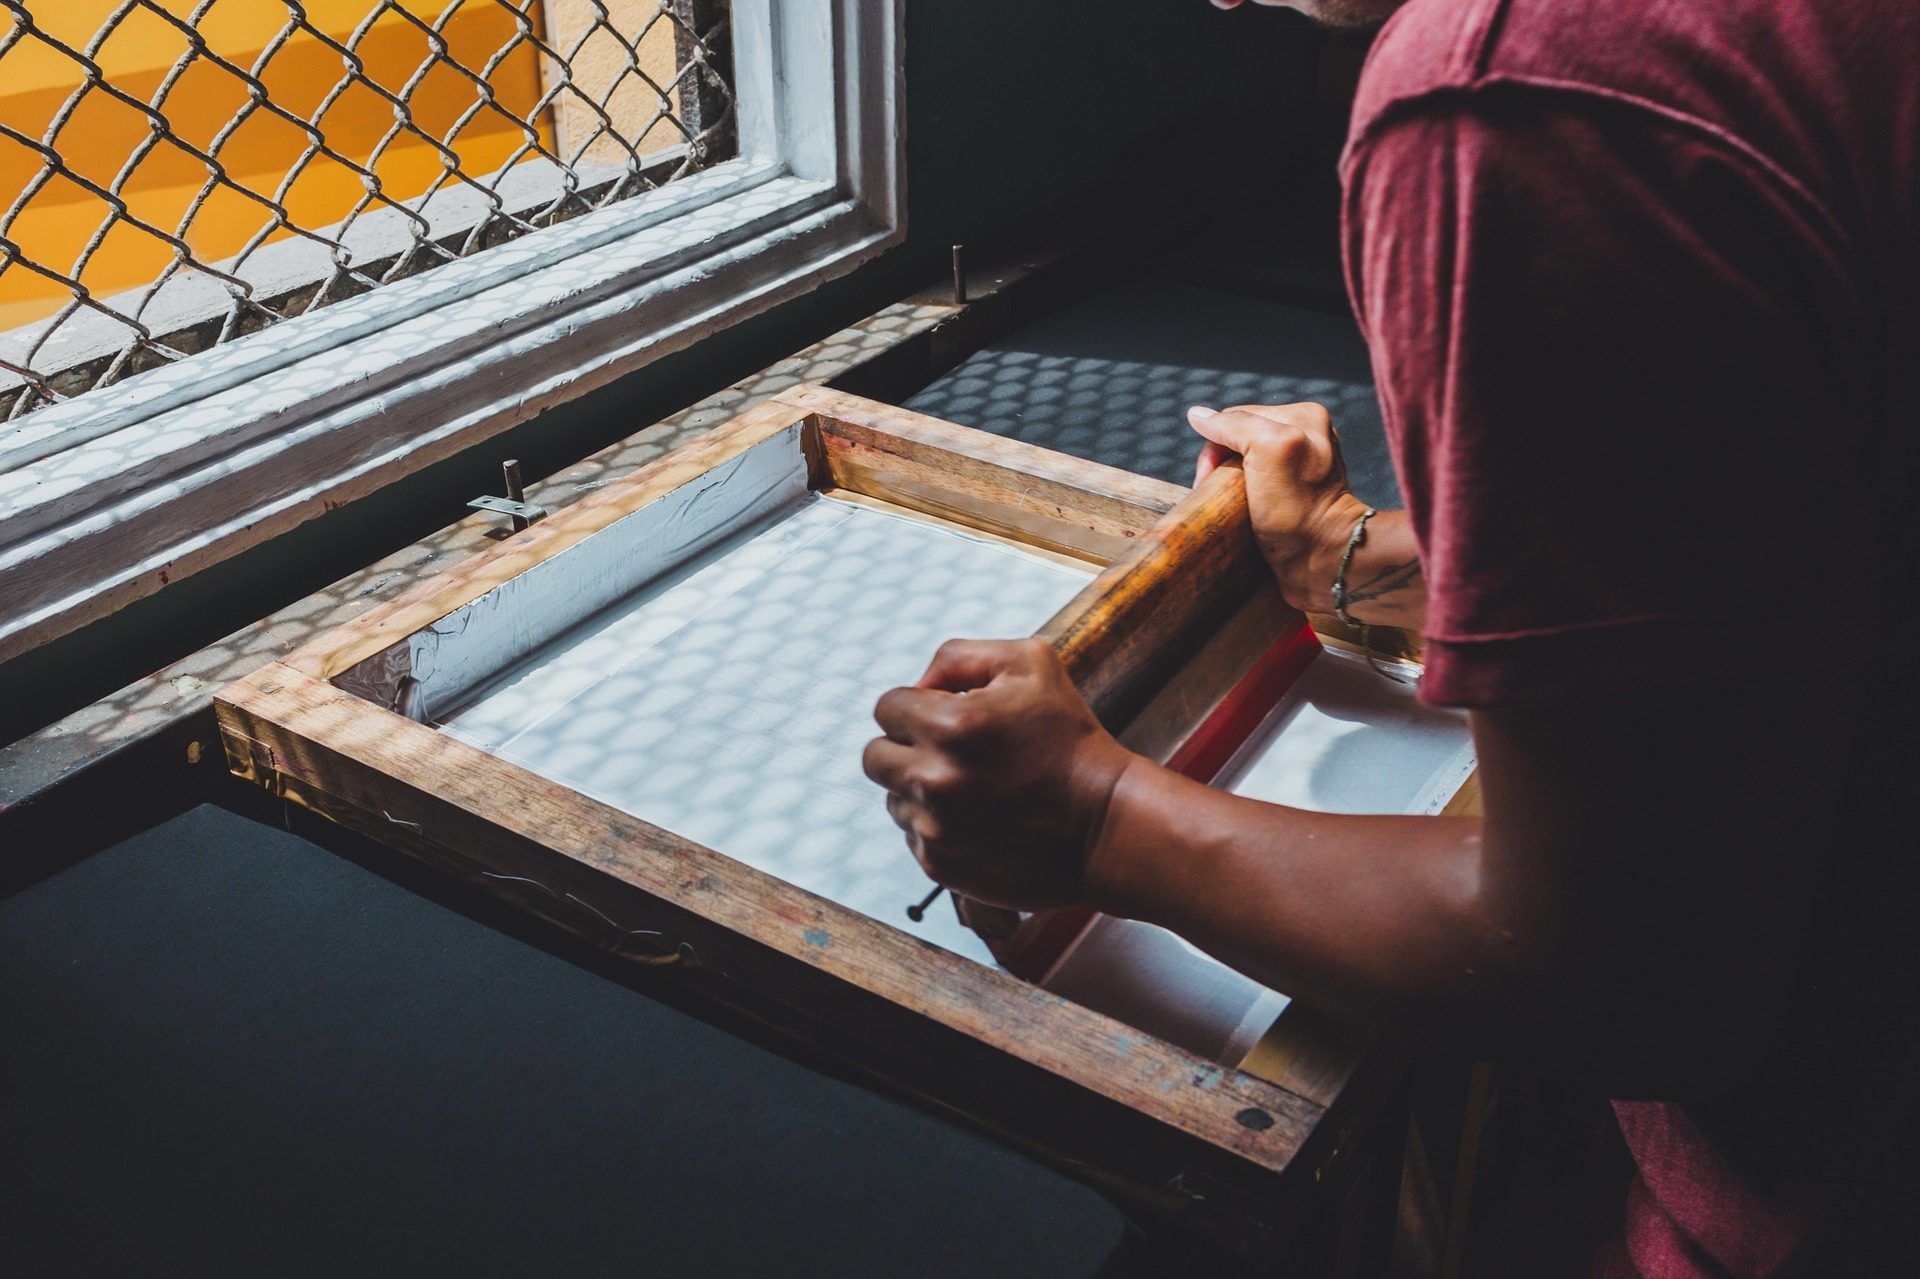 Man Uses Screen Printer by Window